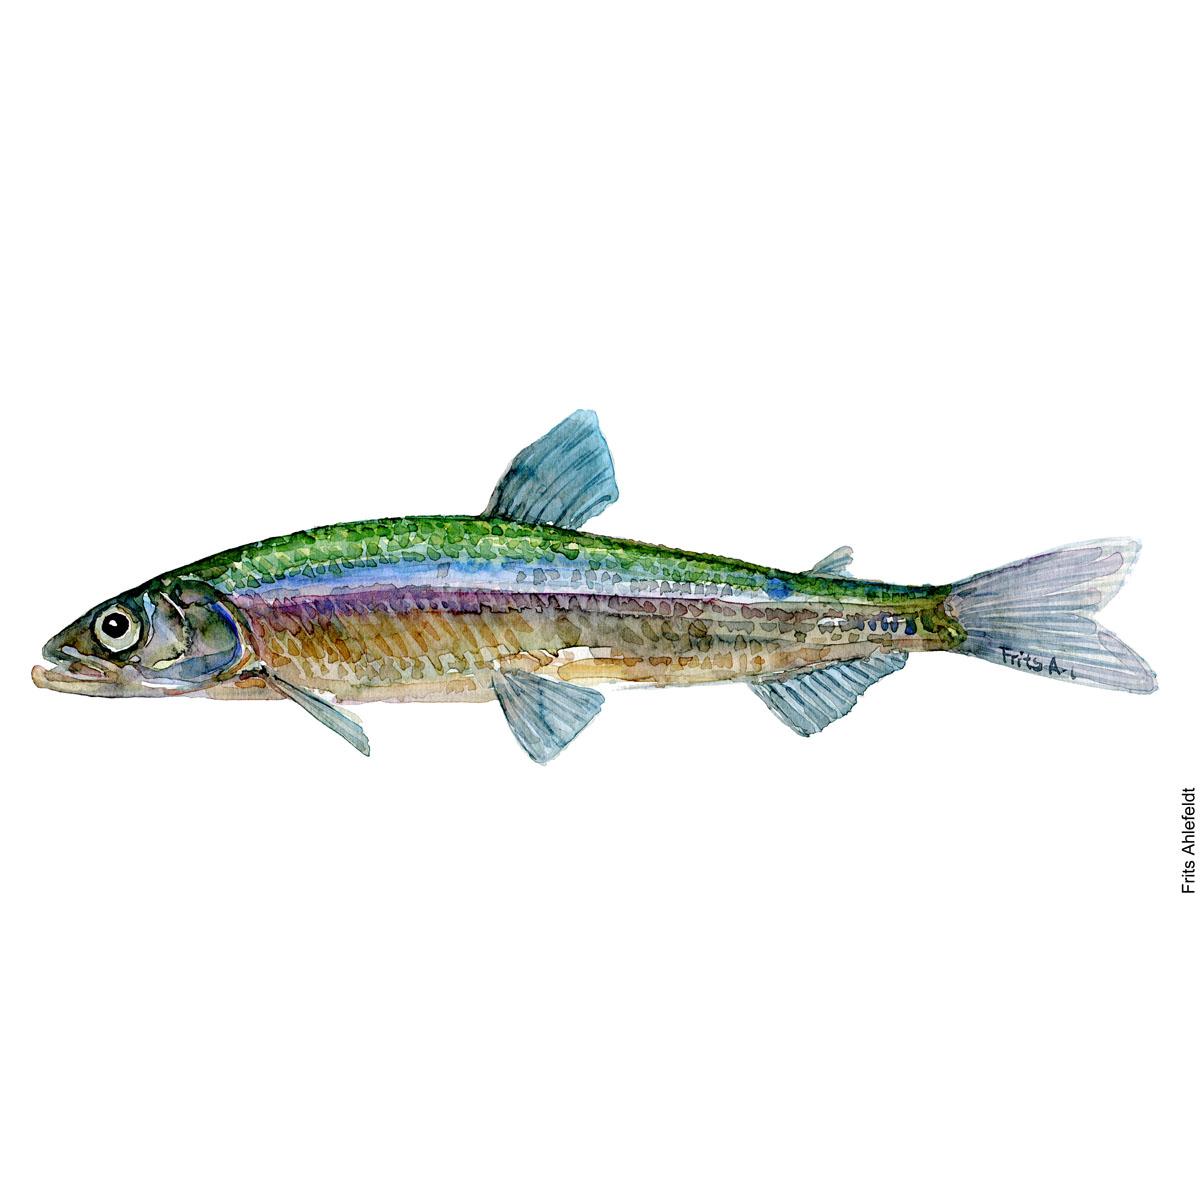 Smelt. Stint. Watercolour, Freshwater fish illustration by Frits Ahlefeldt